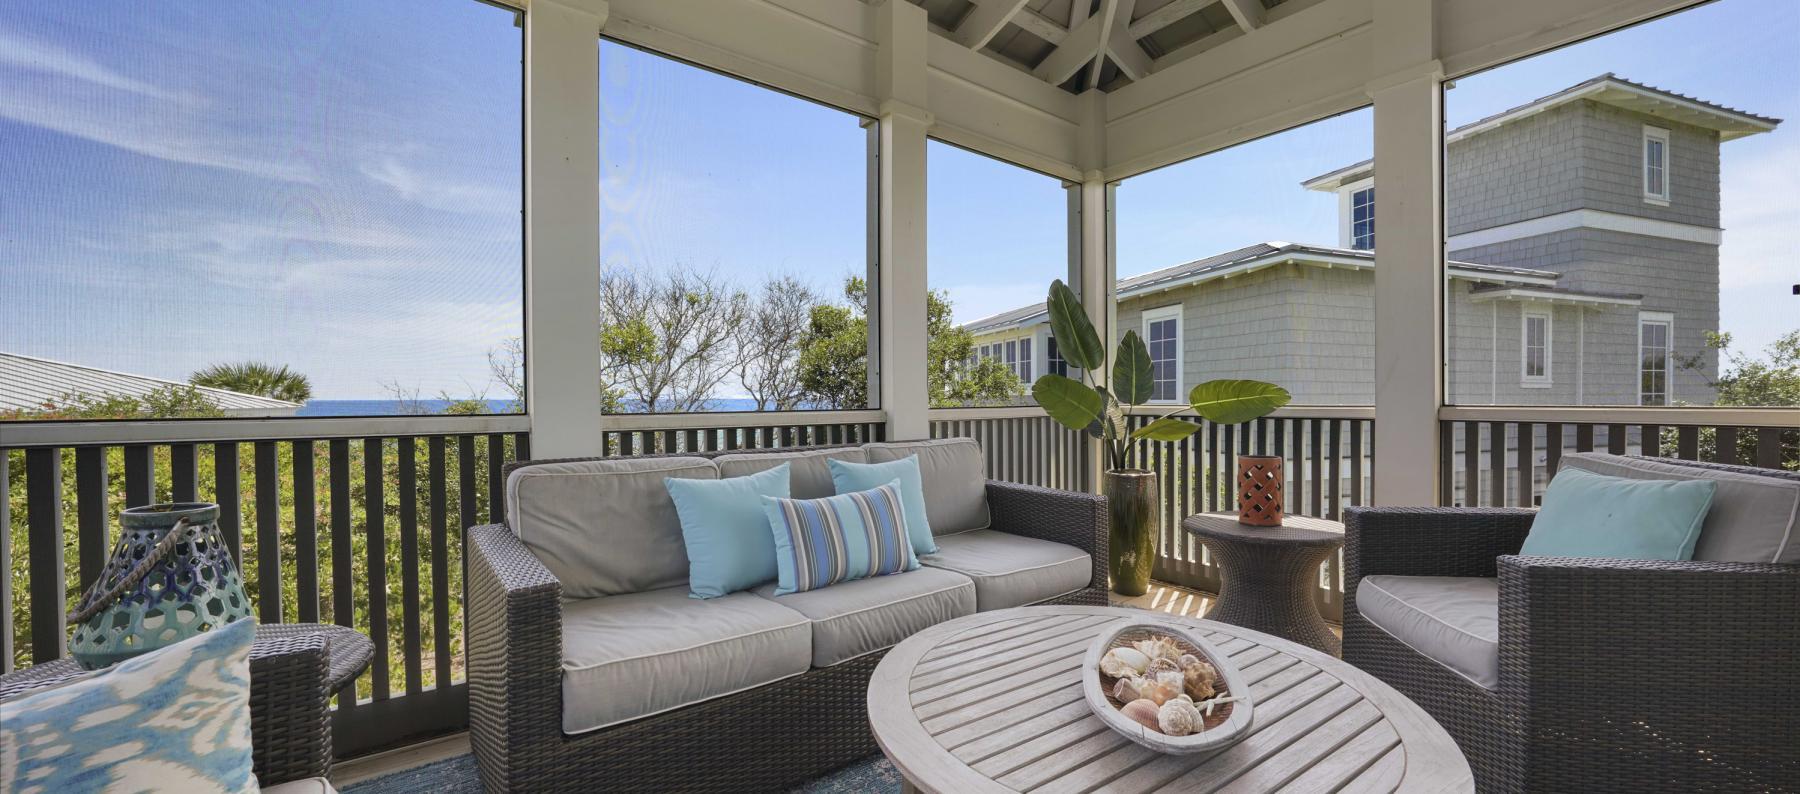 Toye Cottage in Seaside, Florida